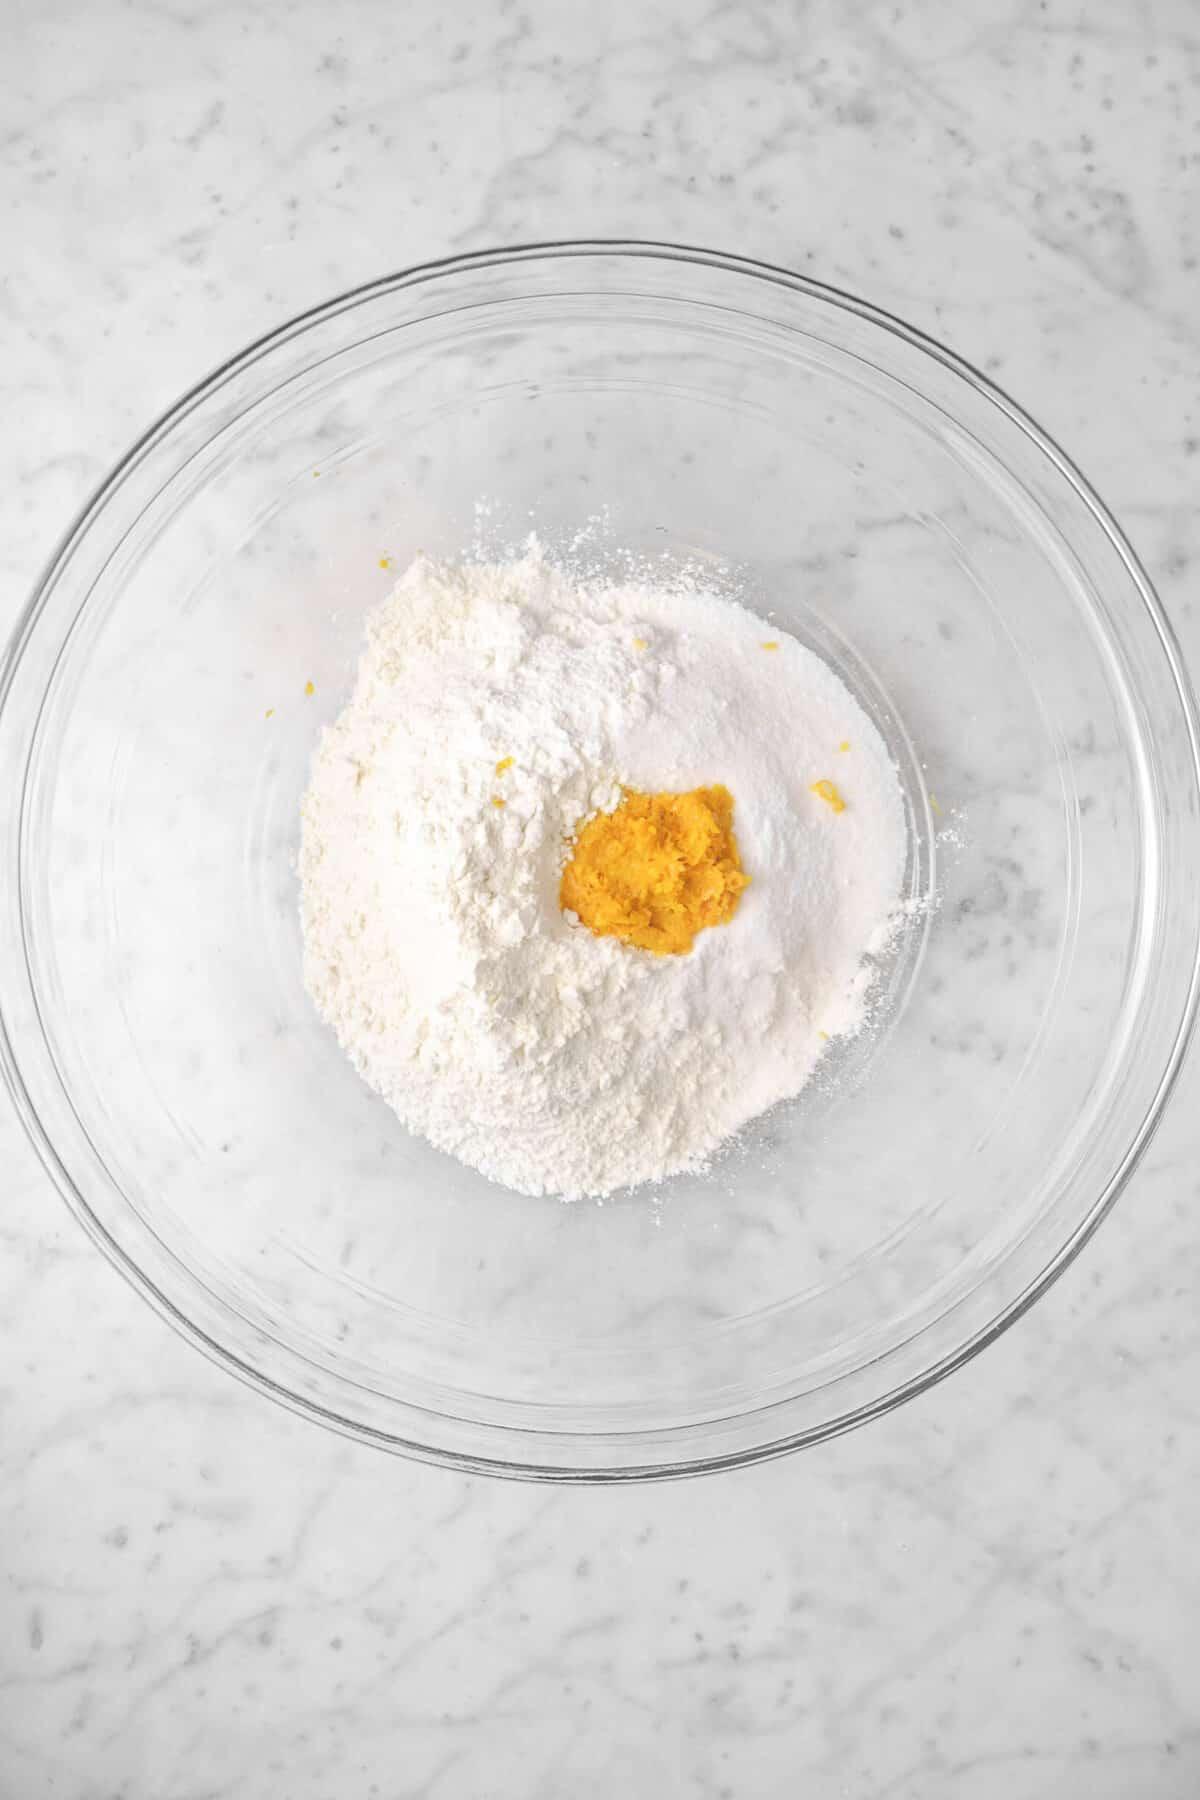 flour, sugar, salt, and orange zest in a glass bowl